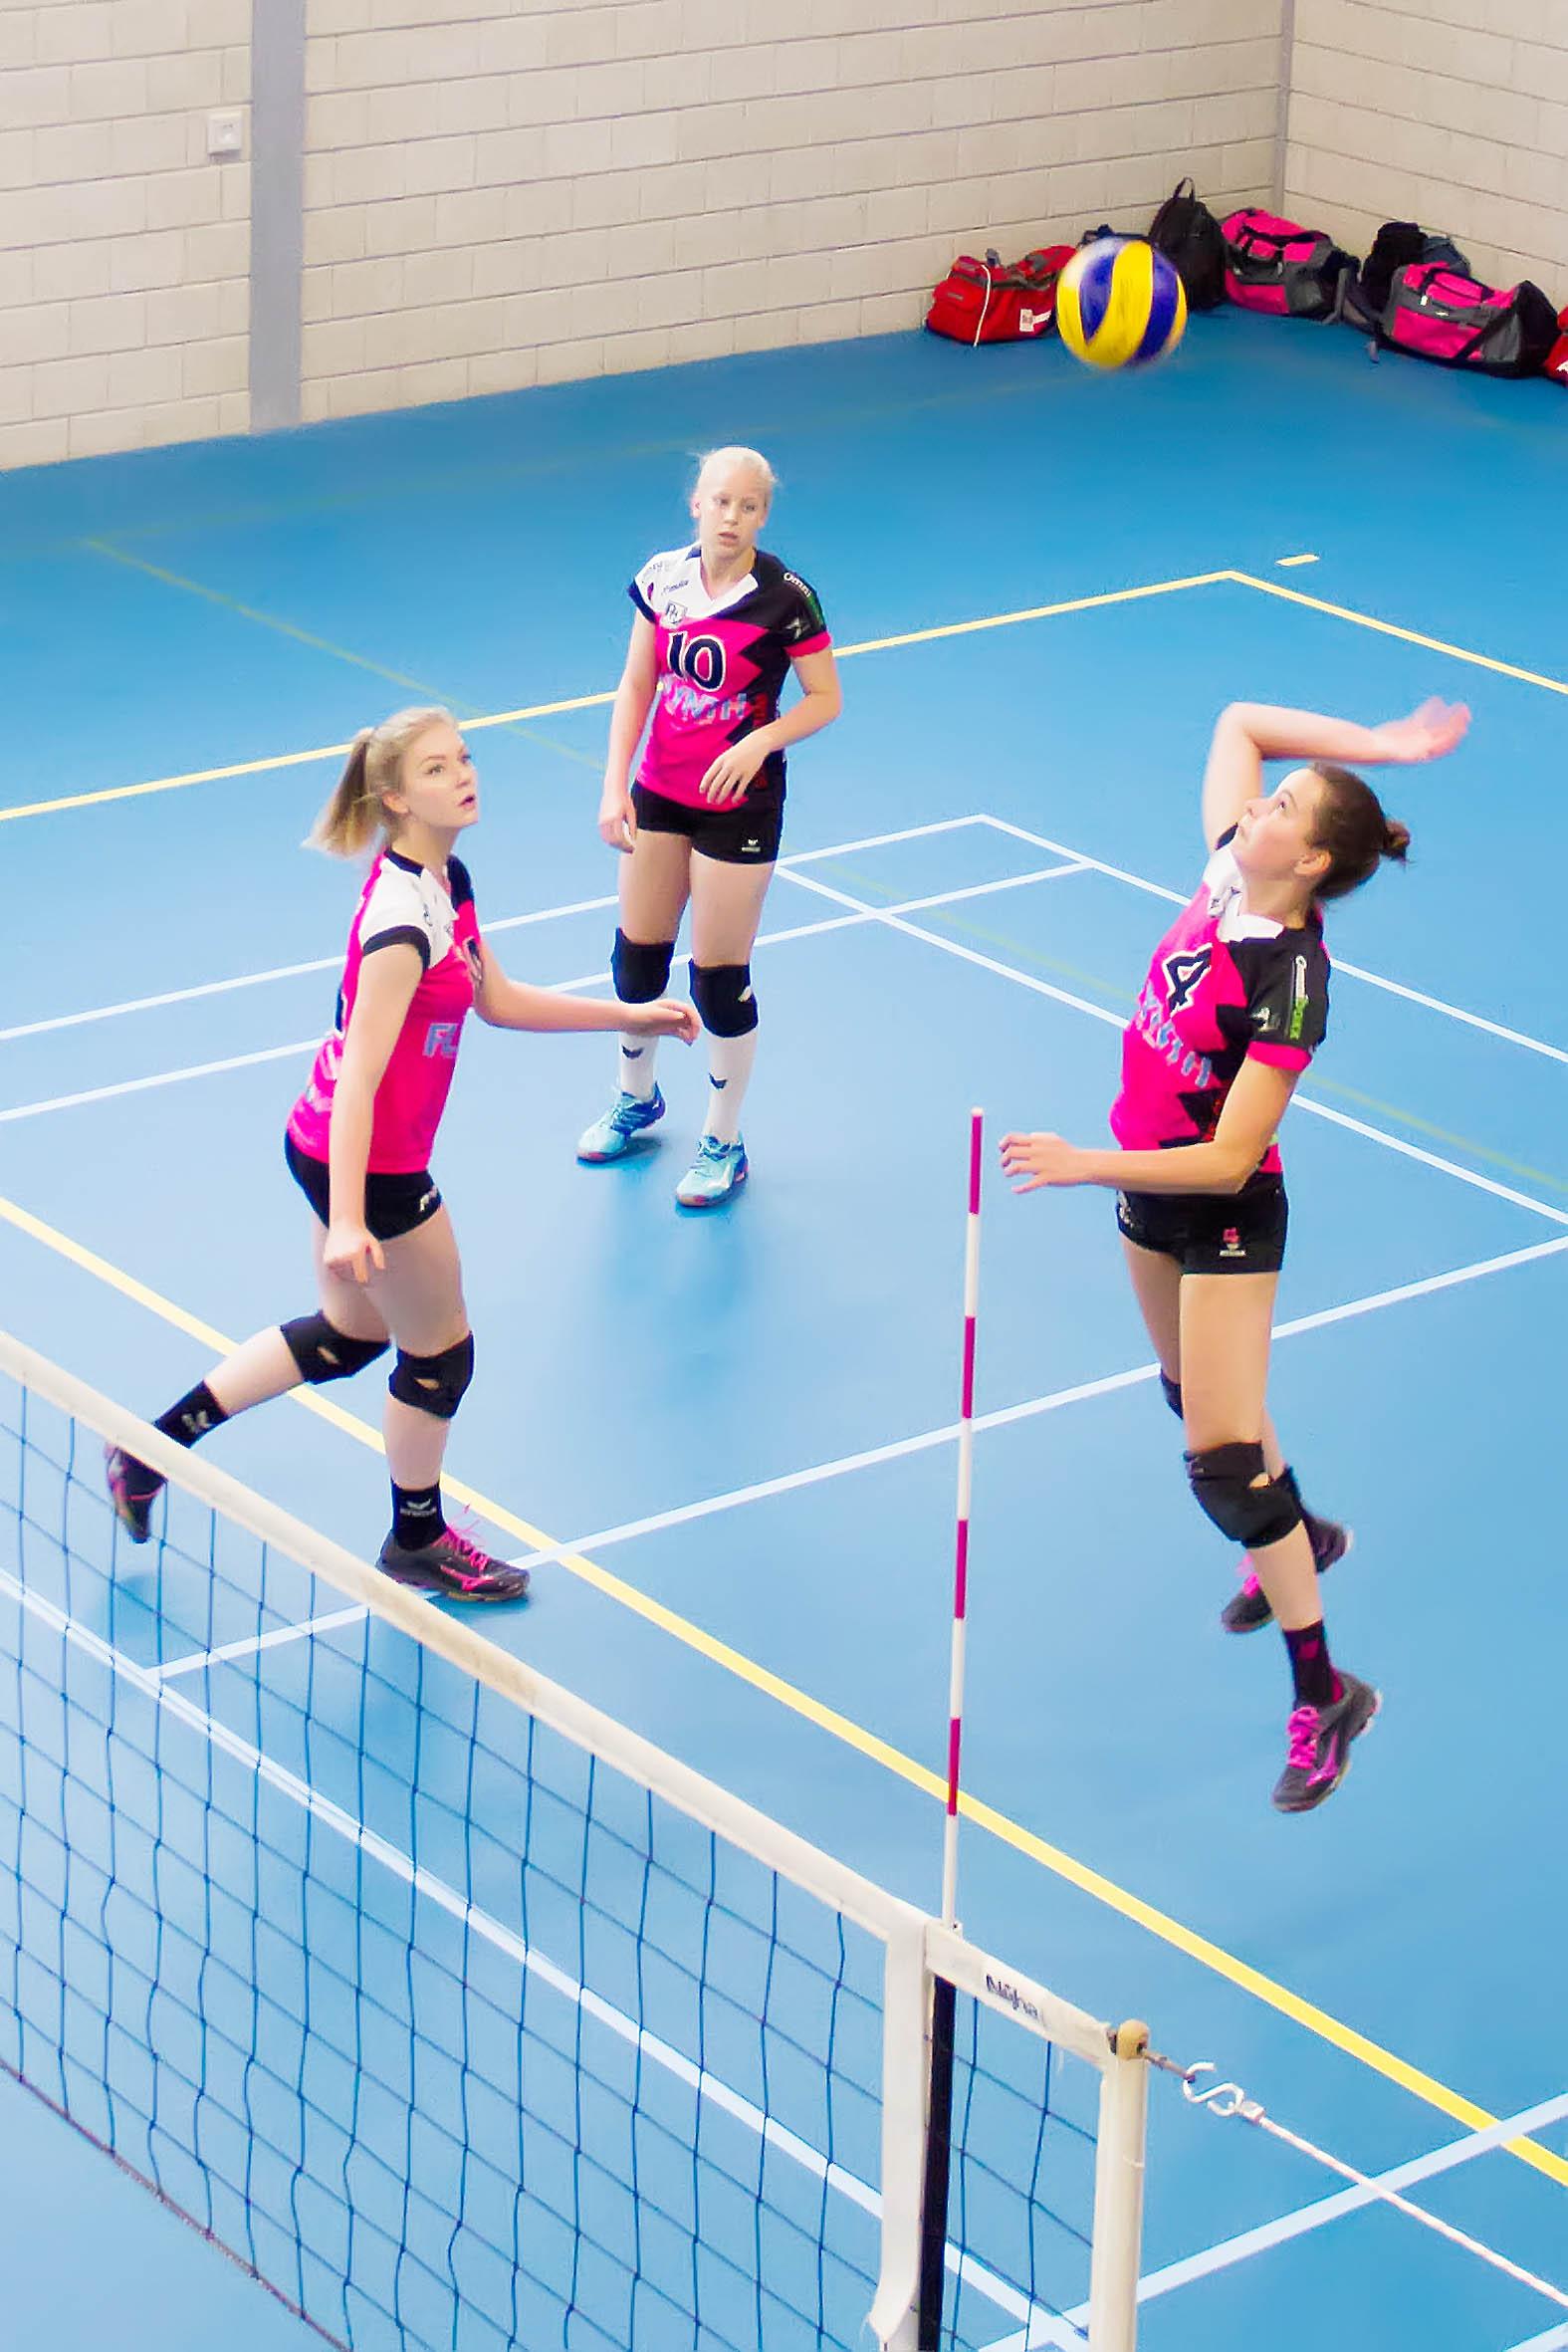 Volleybal op Eredivisie niveau